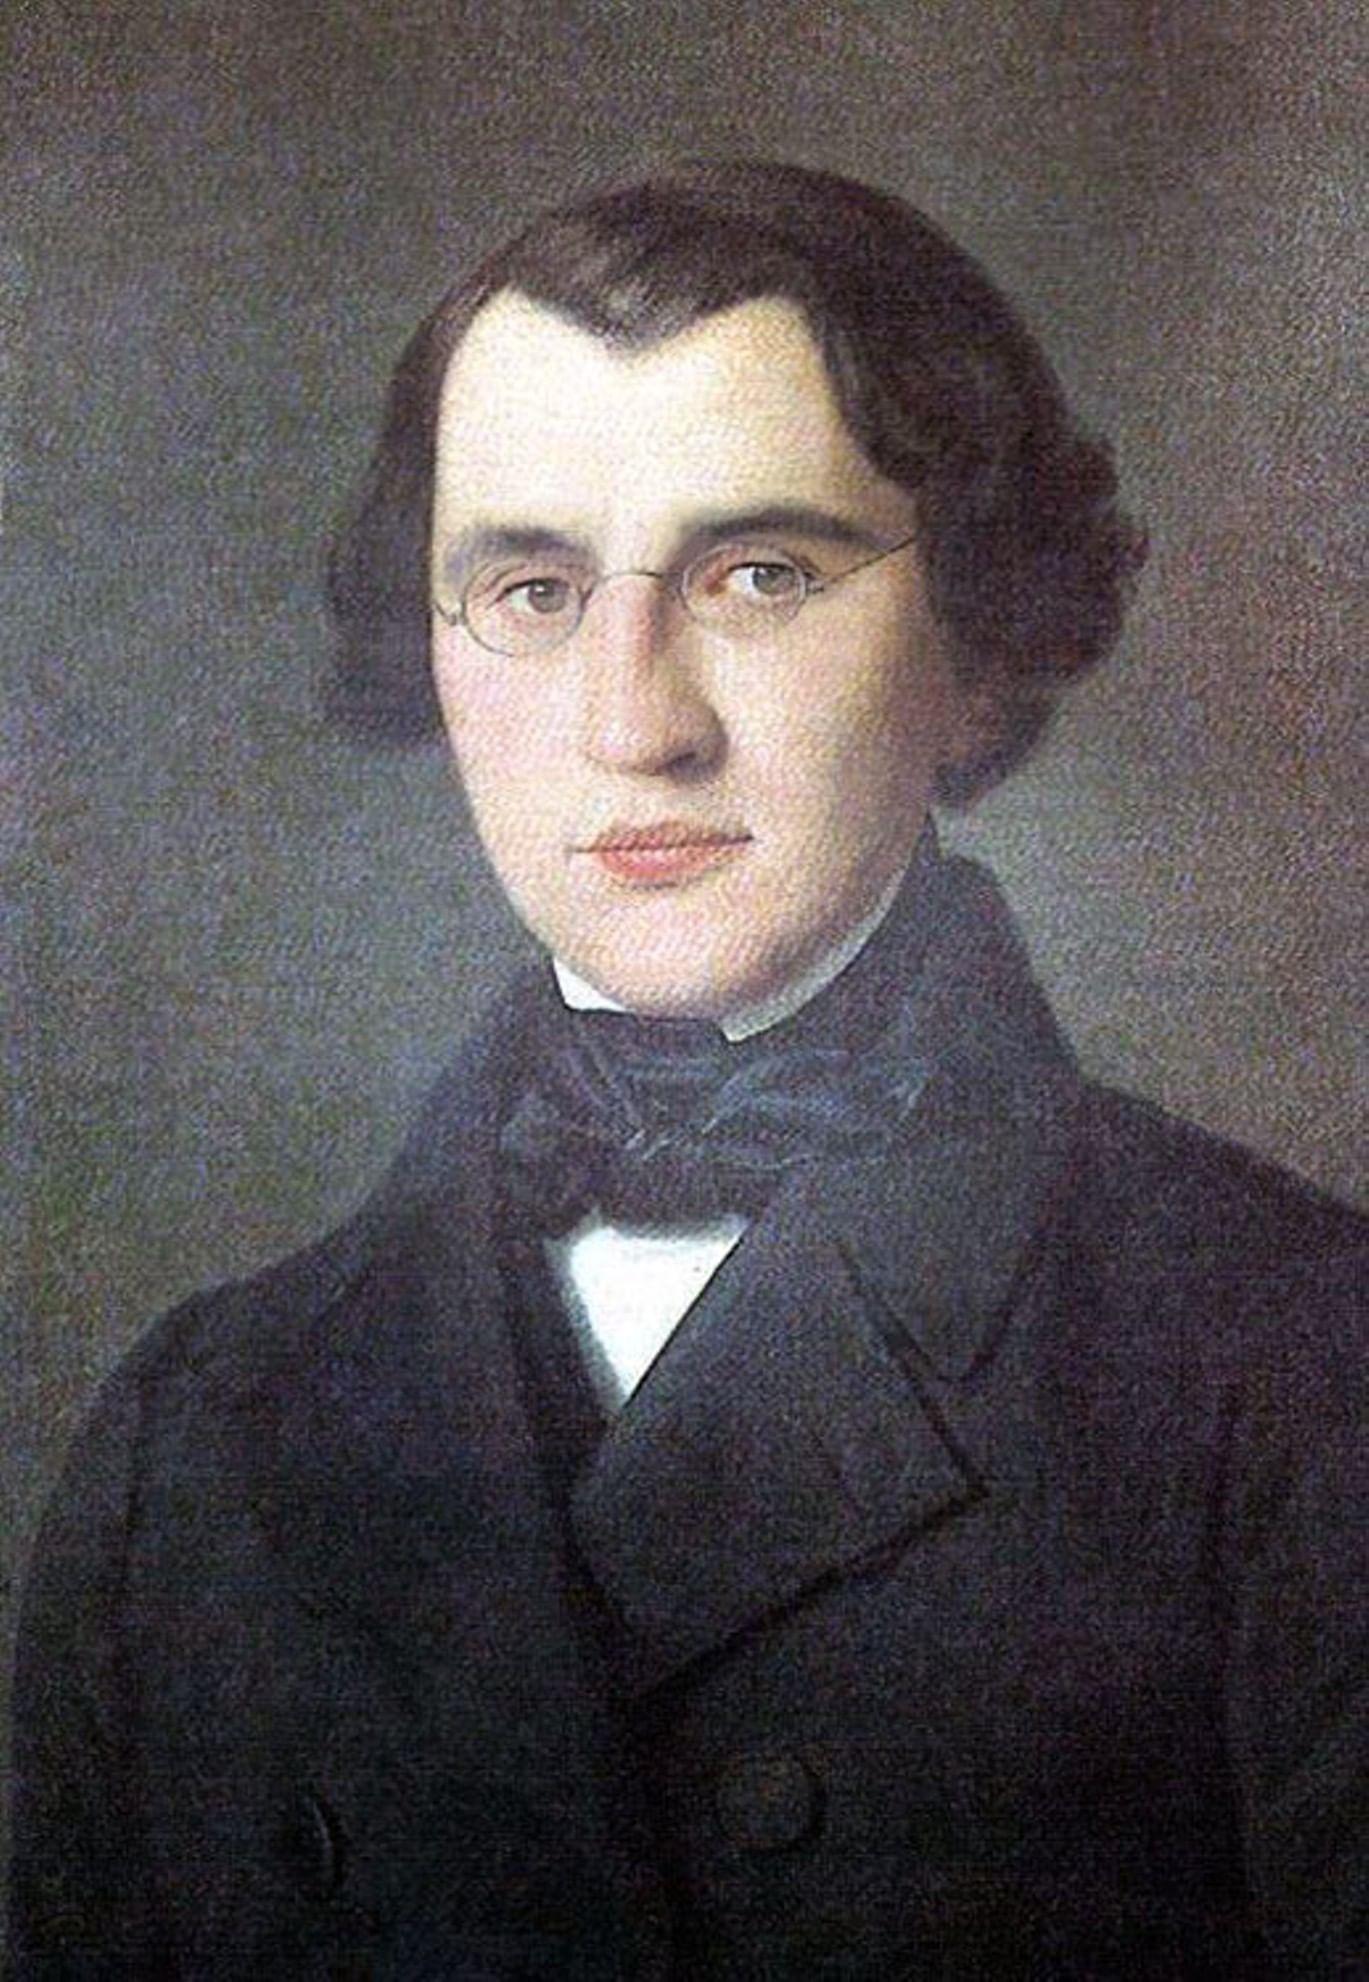 Иван Тургенев. Галерея 1